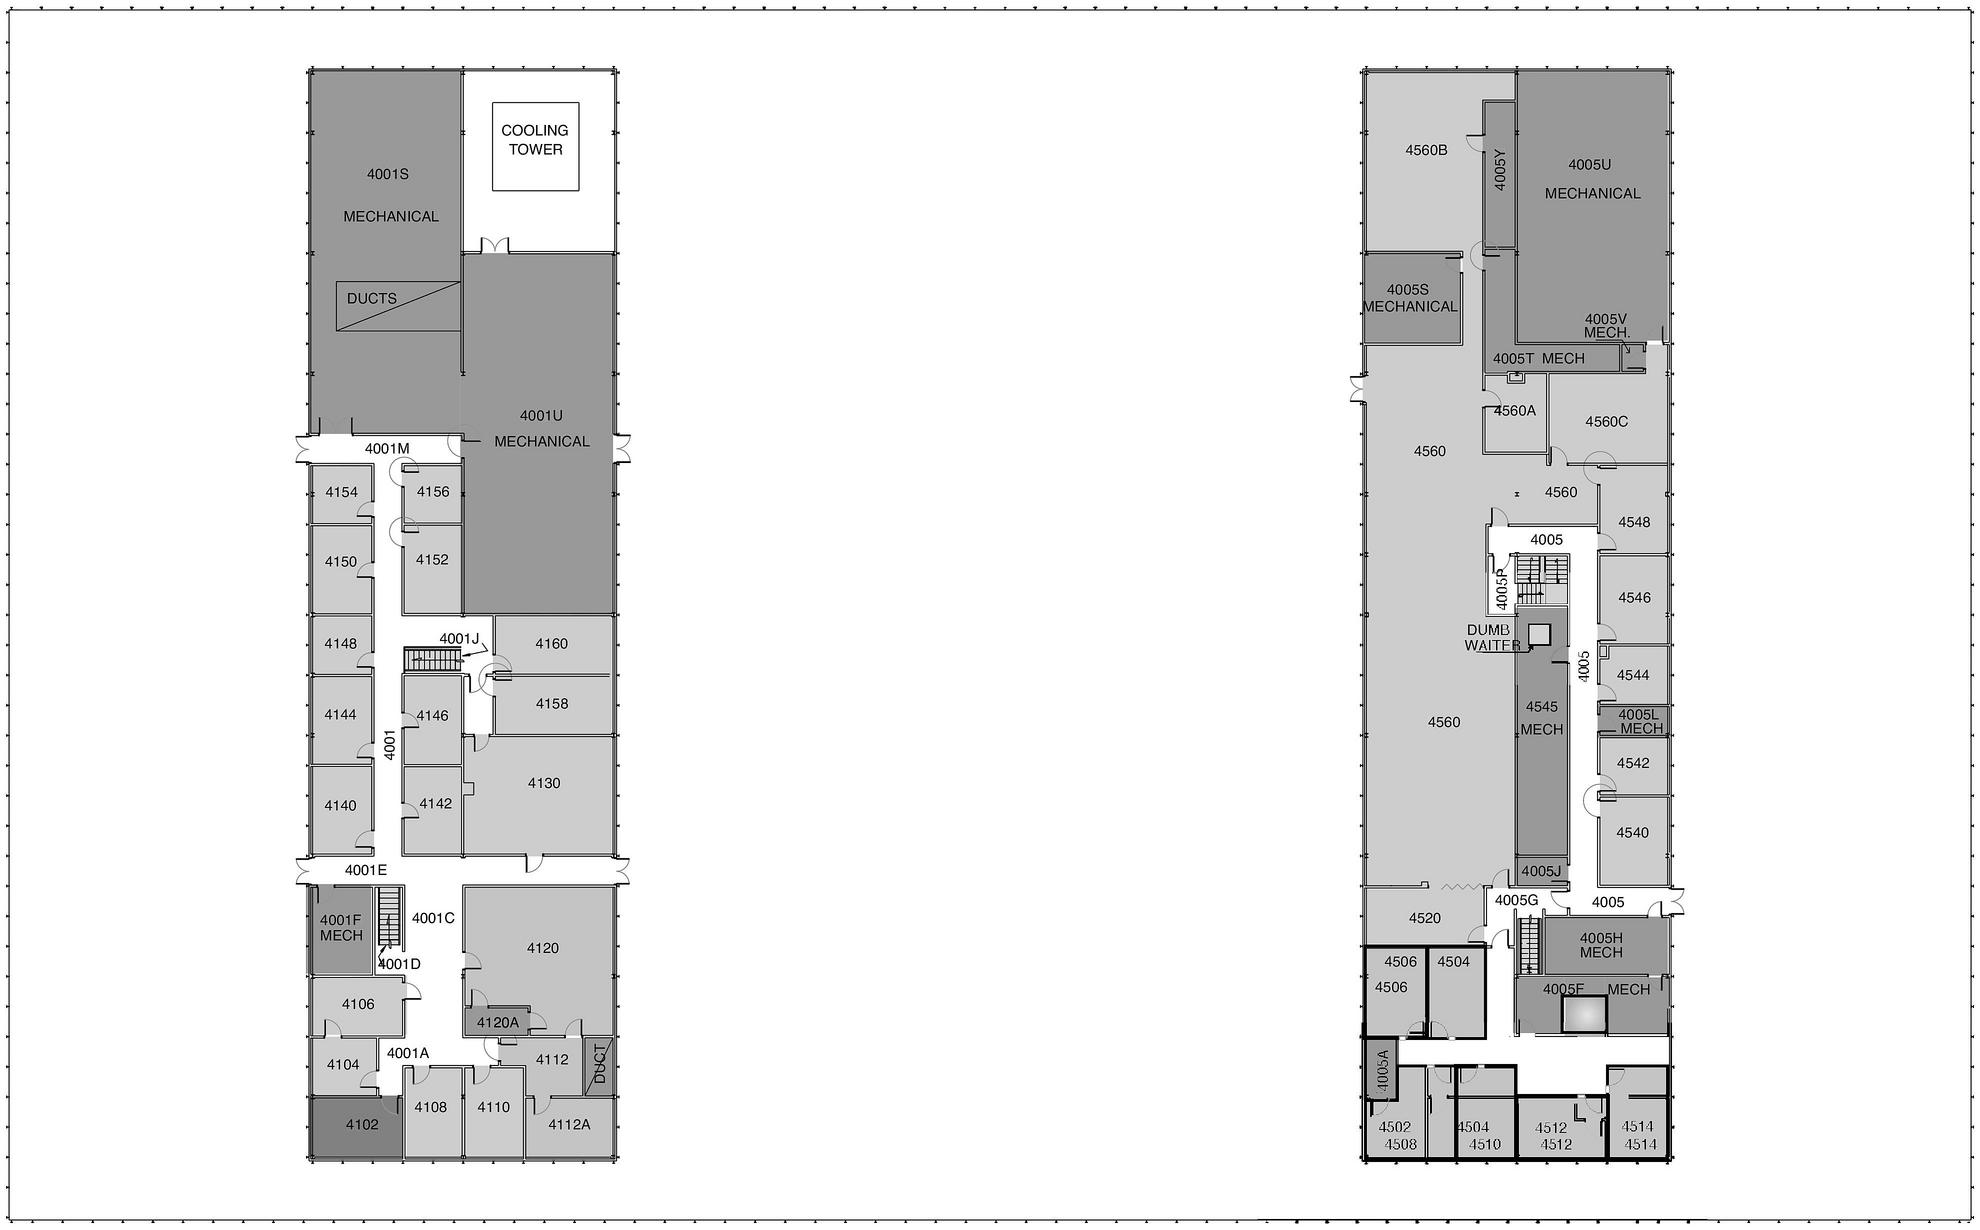 www/floormap/meb4fl-4.jpg